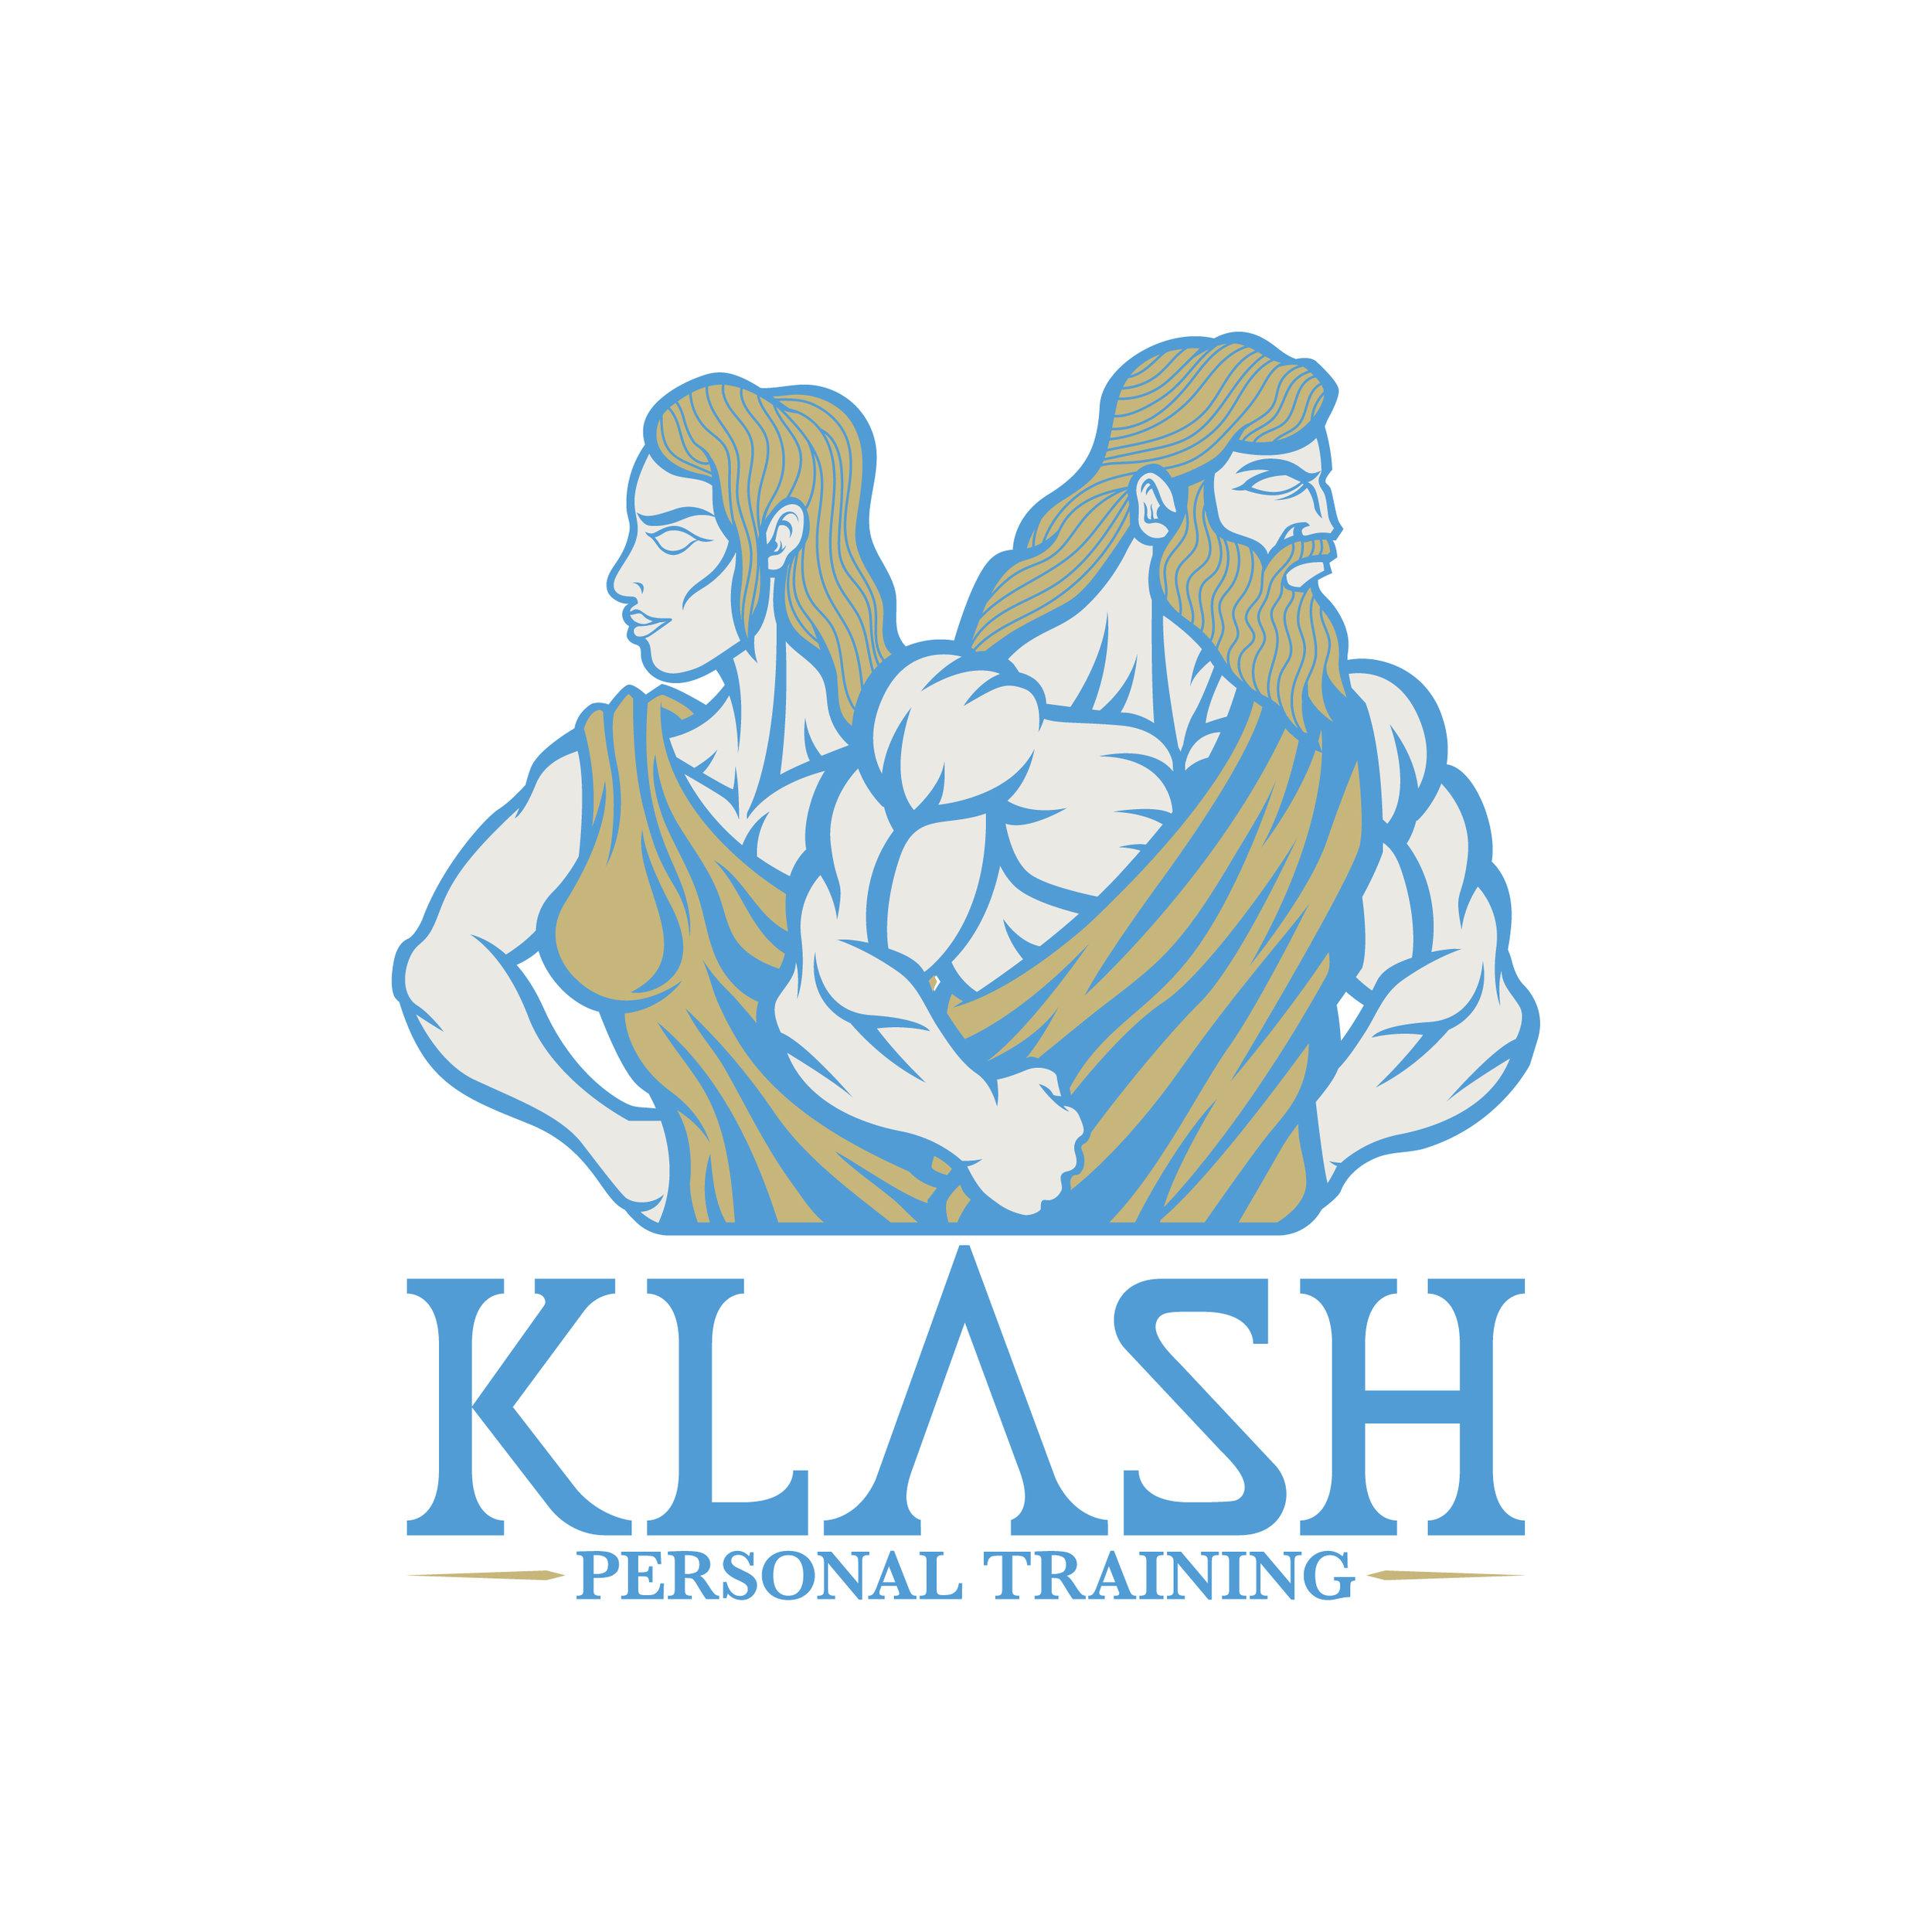 klash-personal-training-logo-logos-branding-greek-roman-graphicdesign-orozco-design-roberto-identity-vegas-lasvegas-vector.jpg